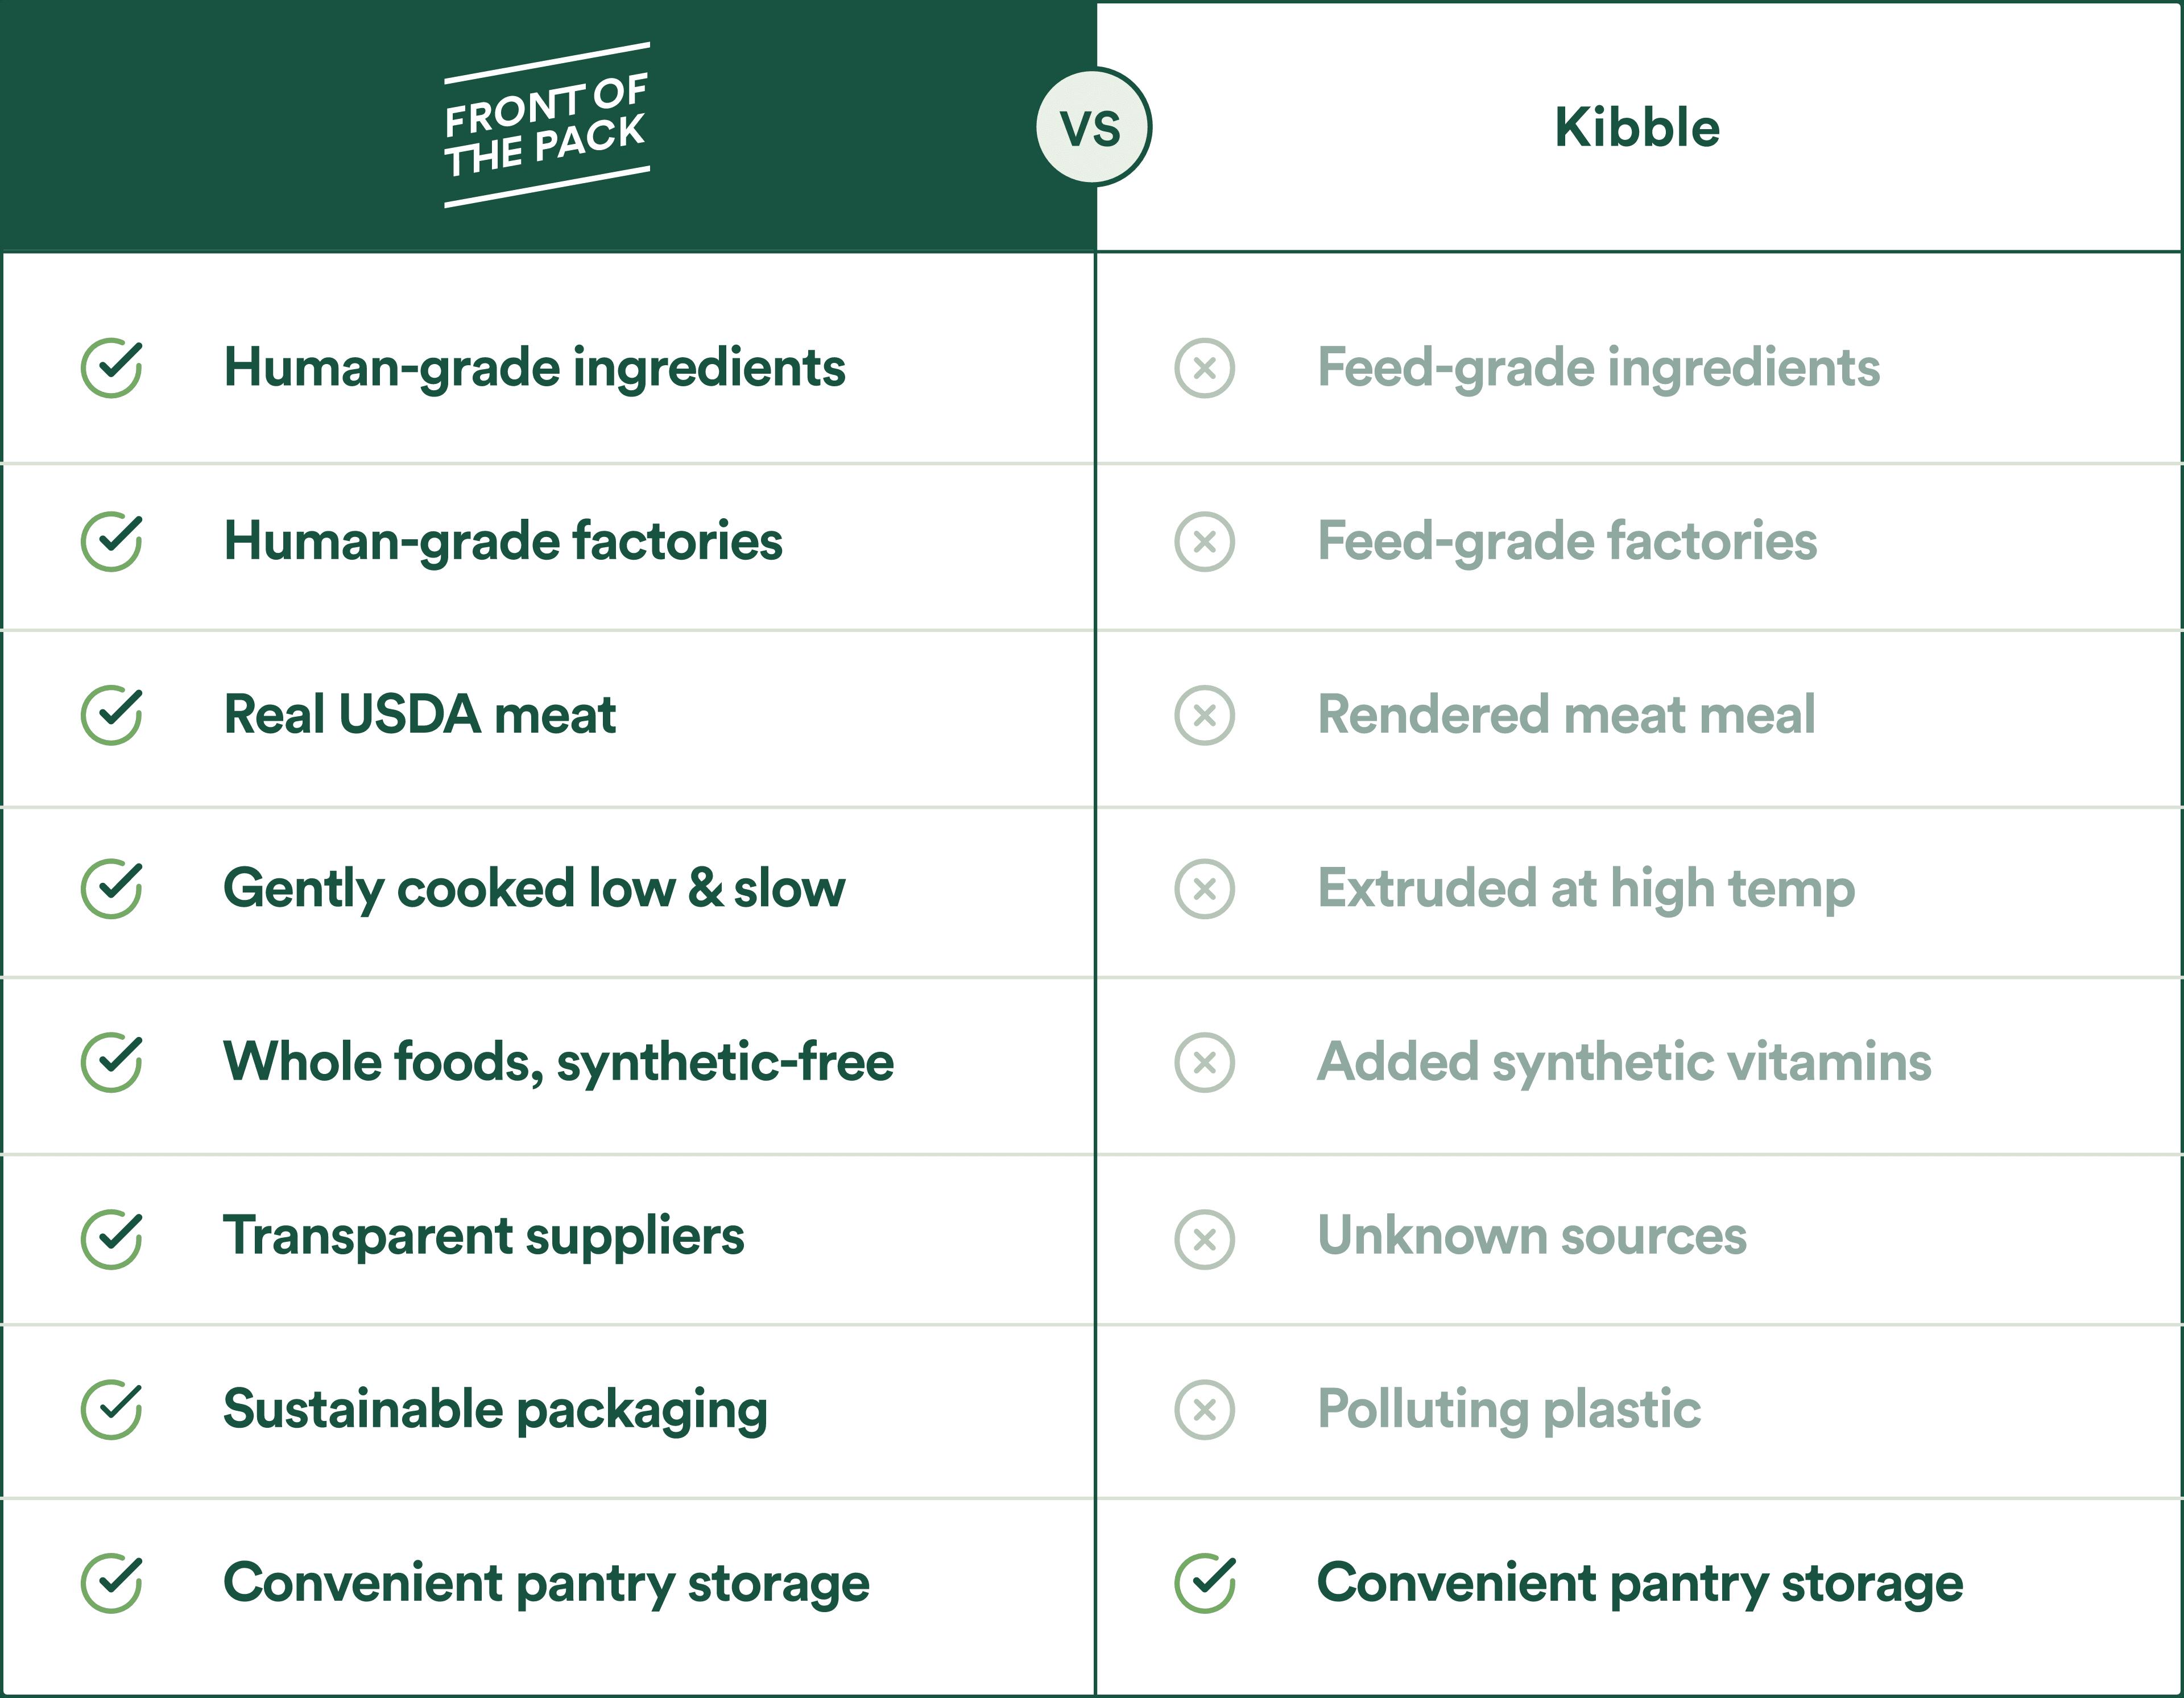 Front of the Pack vs kibble comparison table